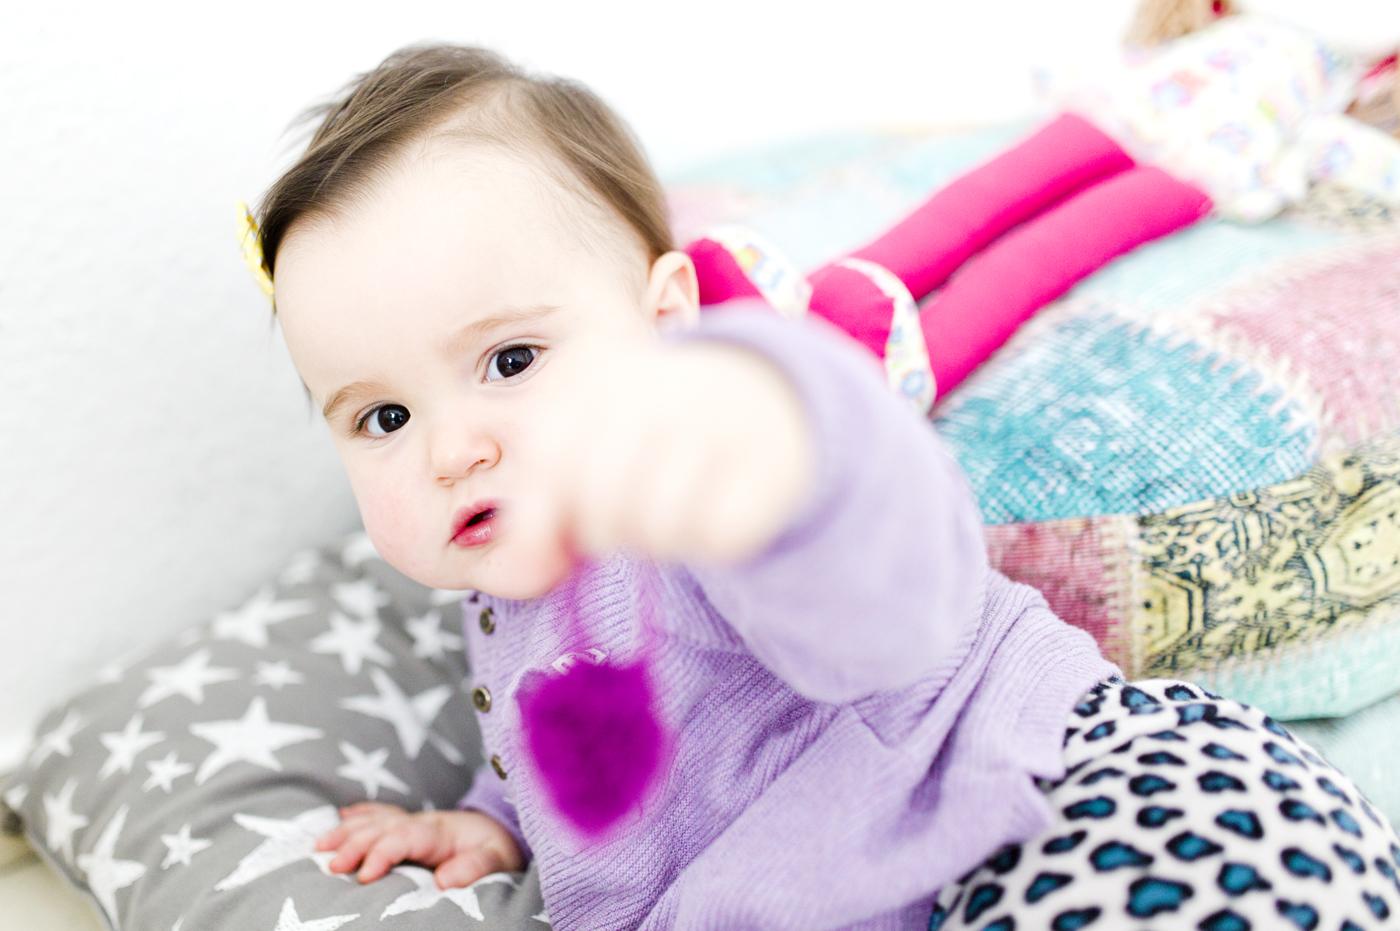 bruna-guerra-photography_baby_letthembelittle009